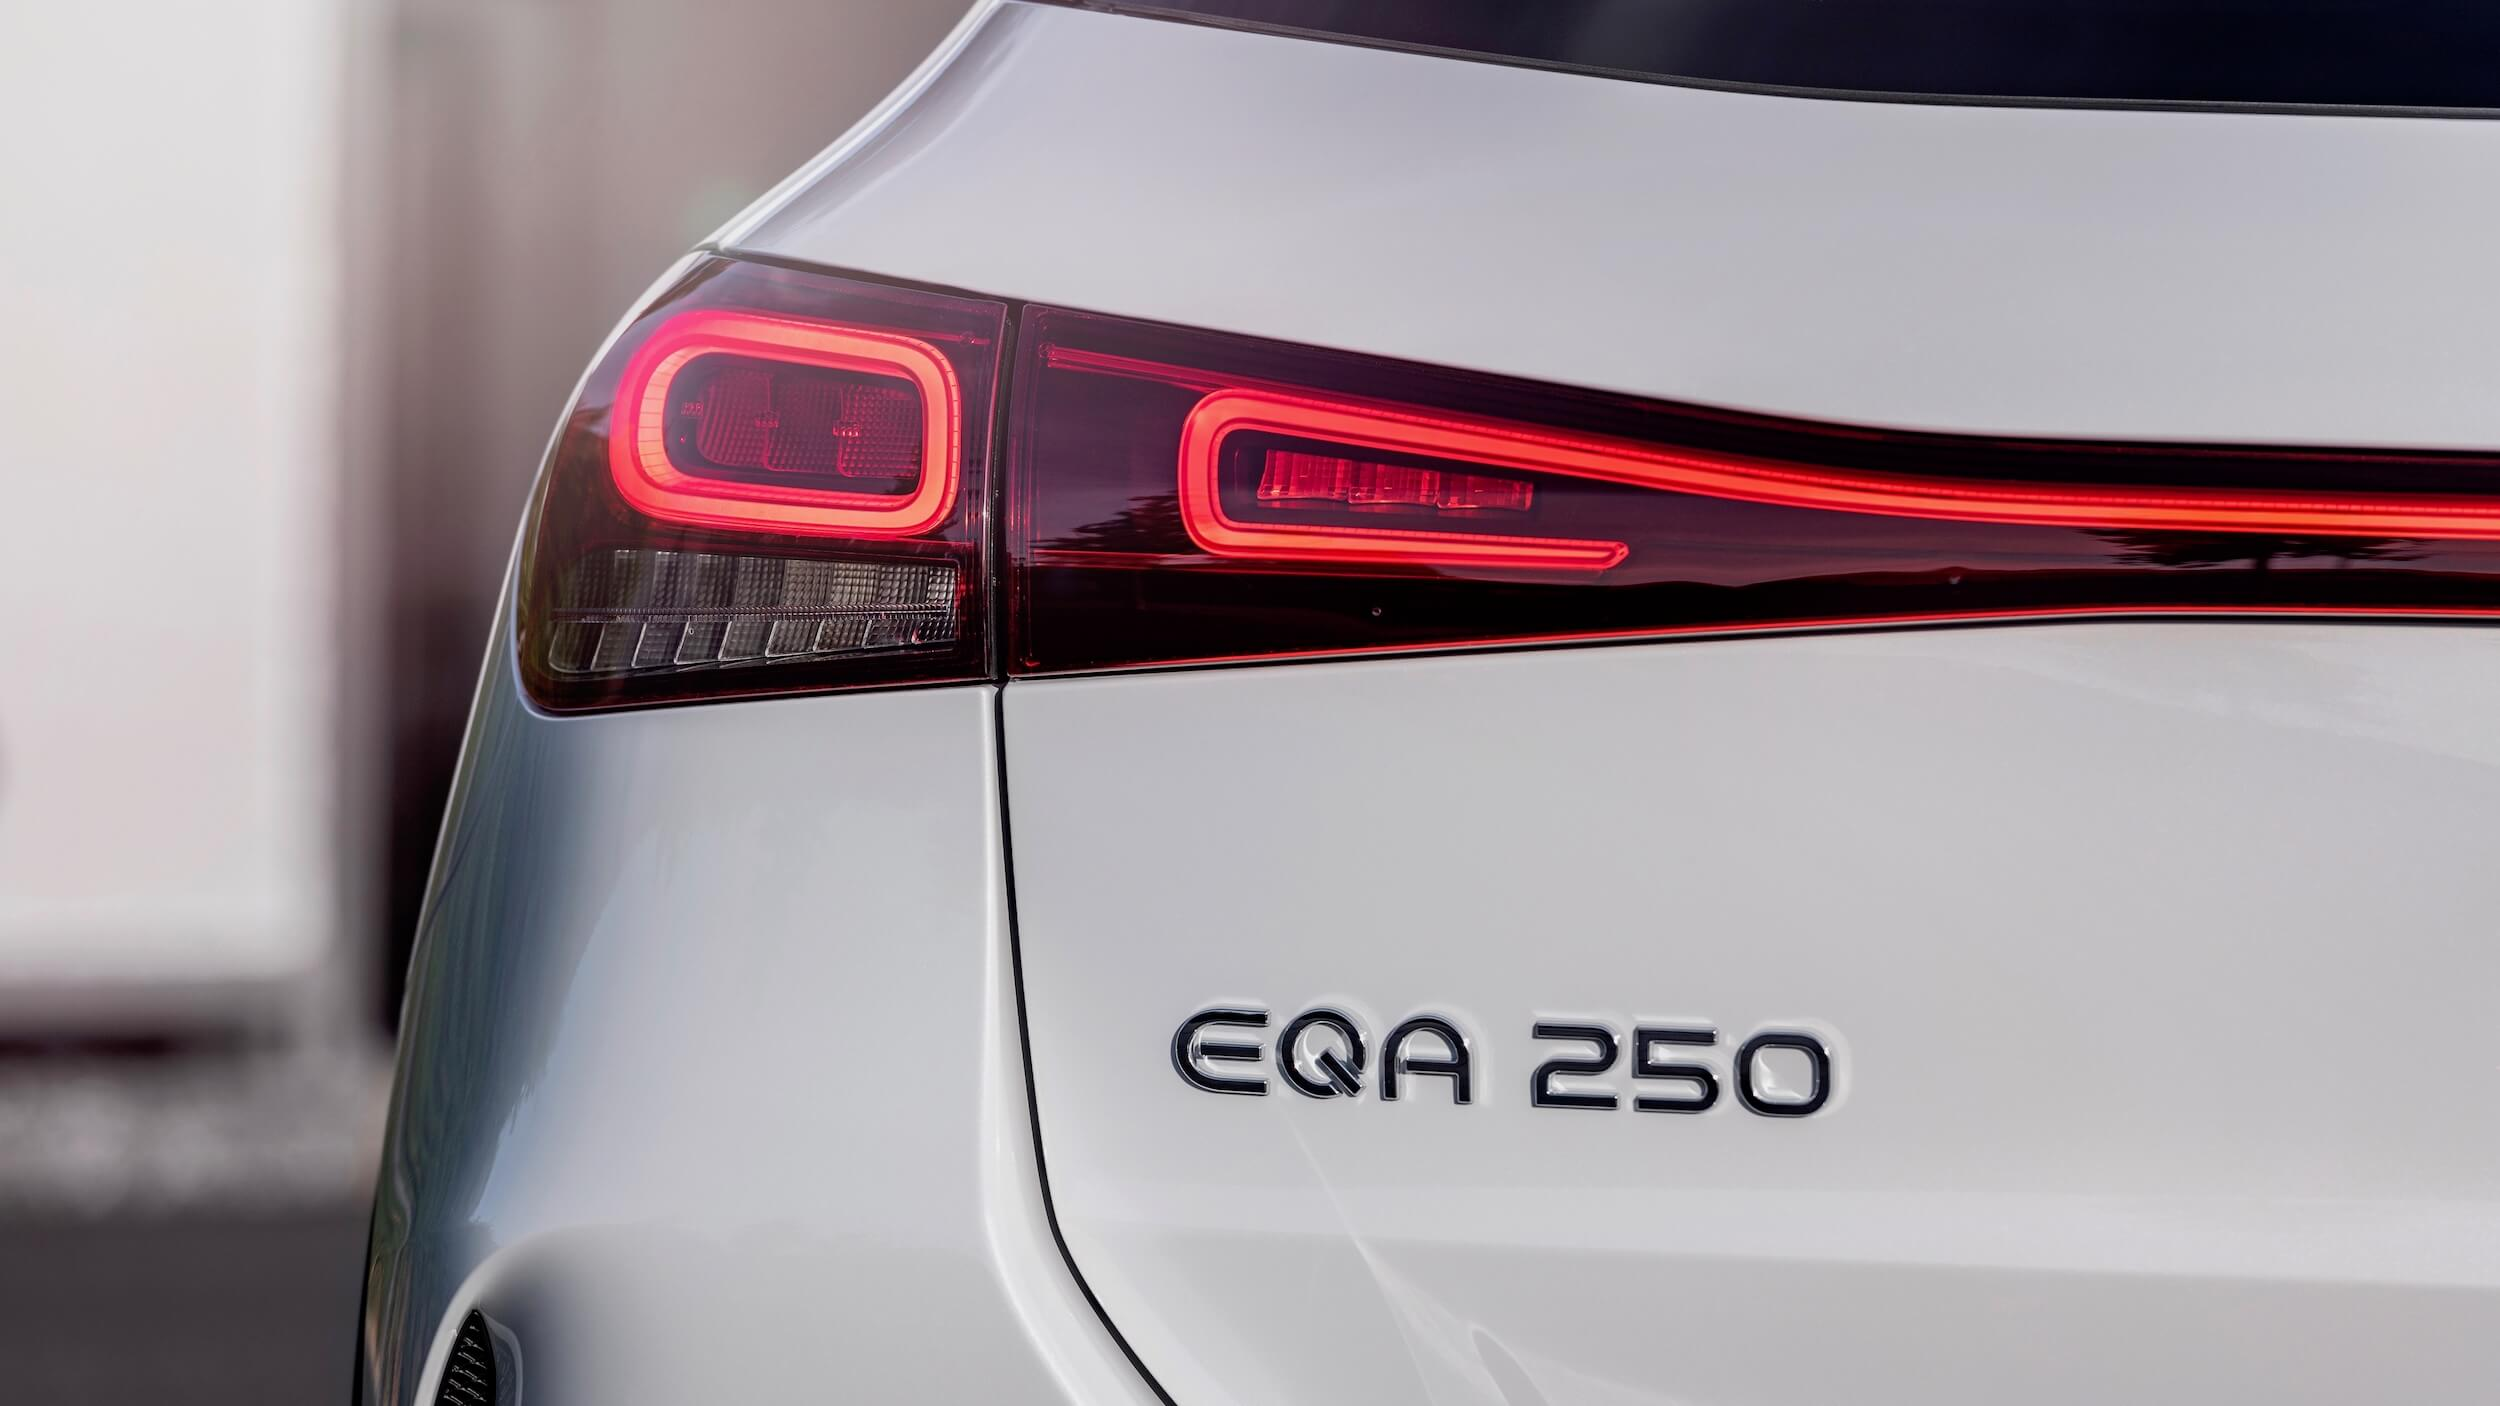 Mercedes EQA 250 badge